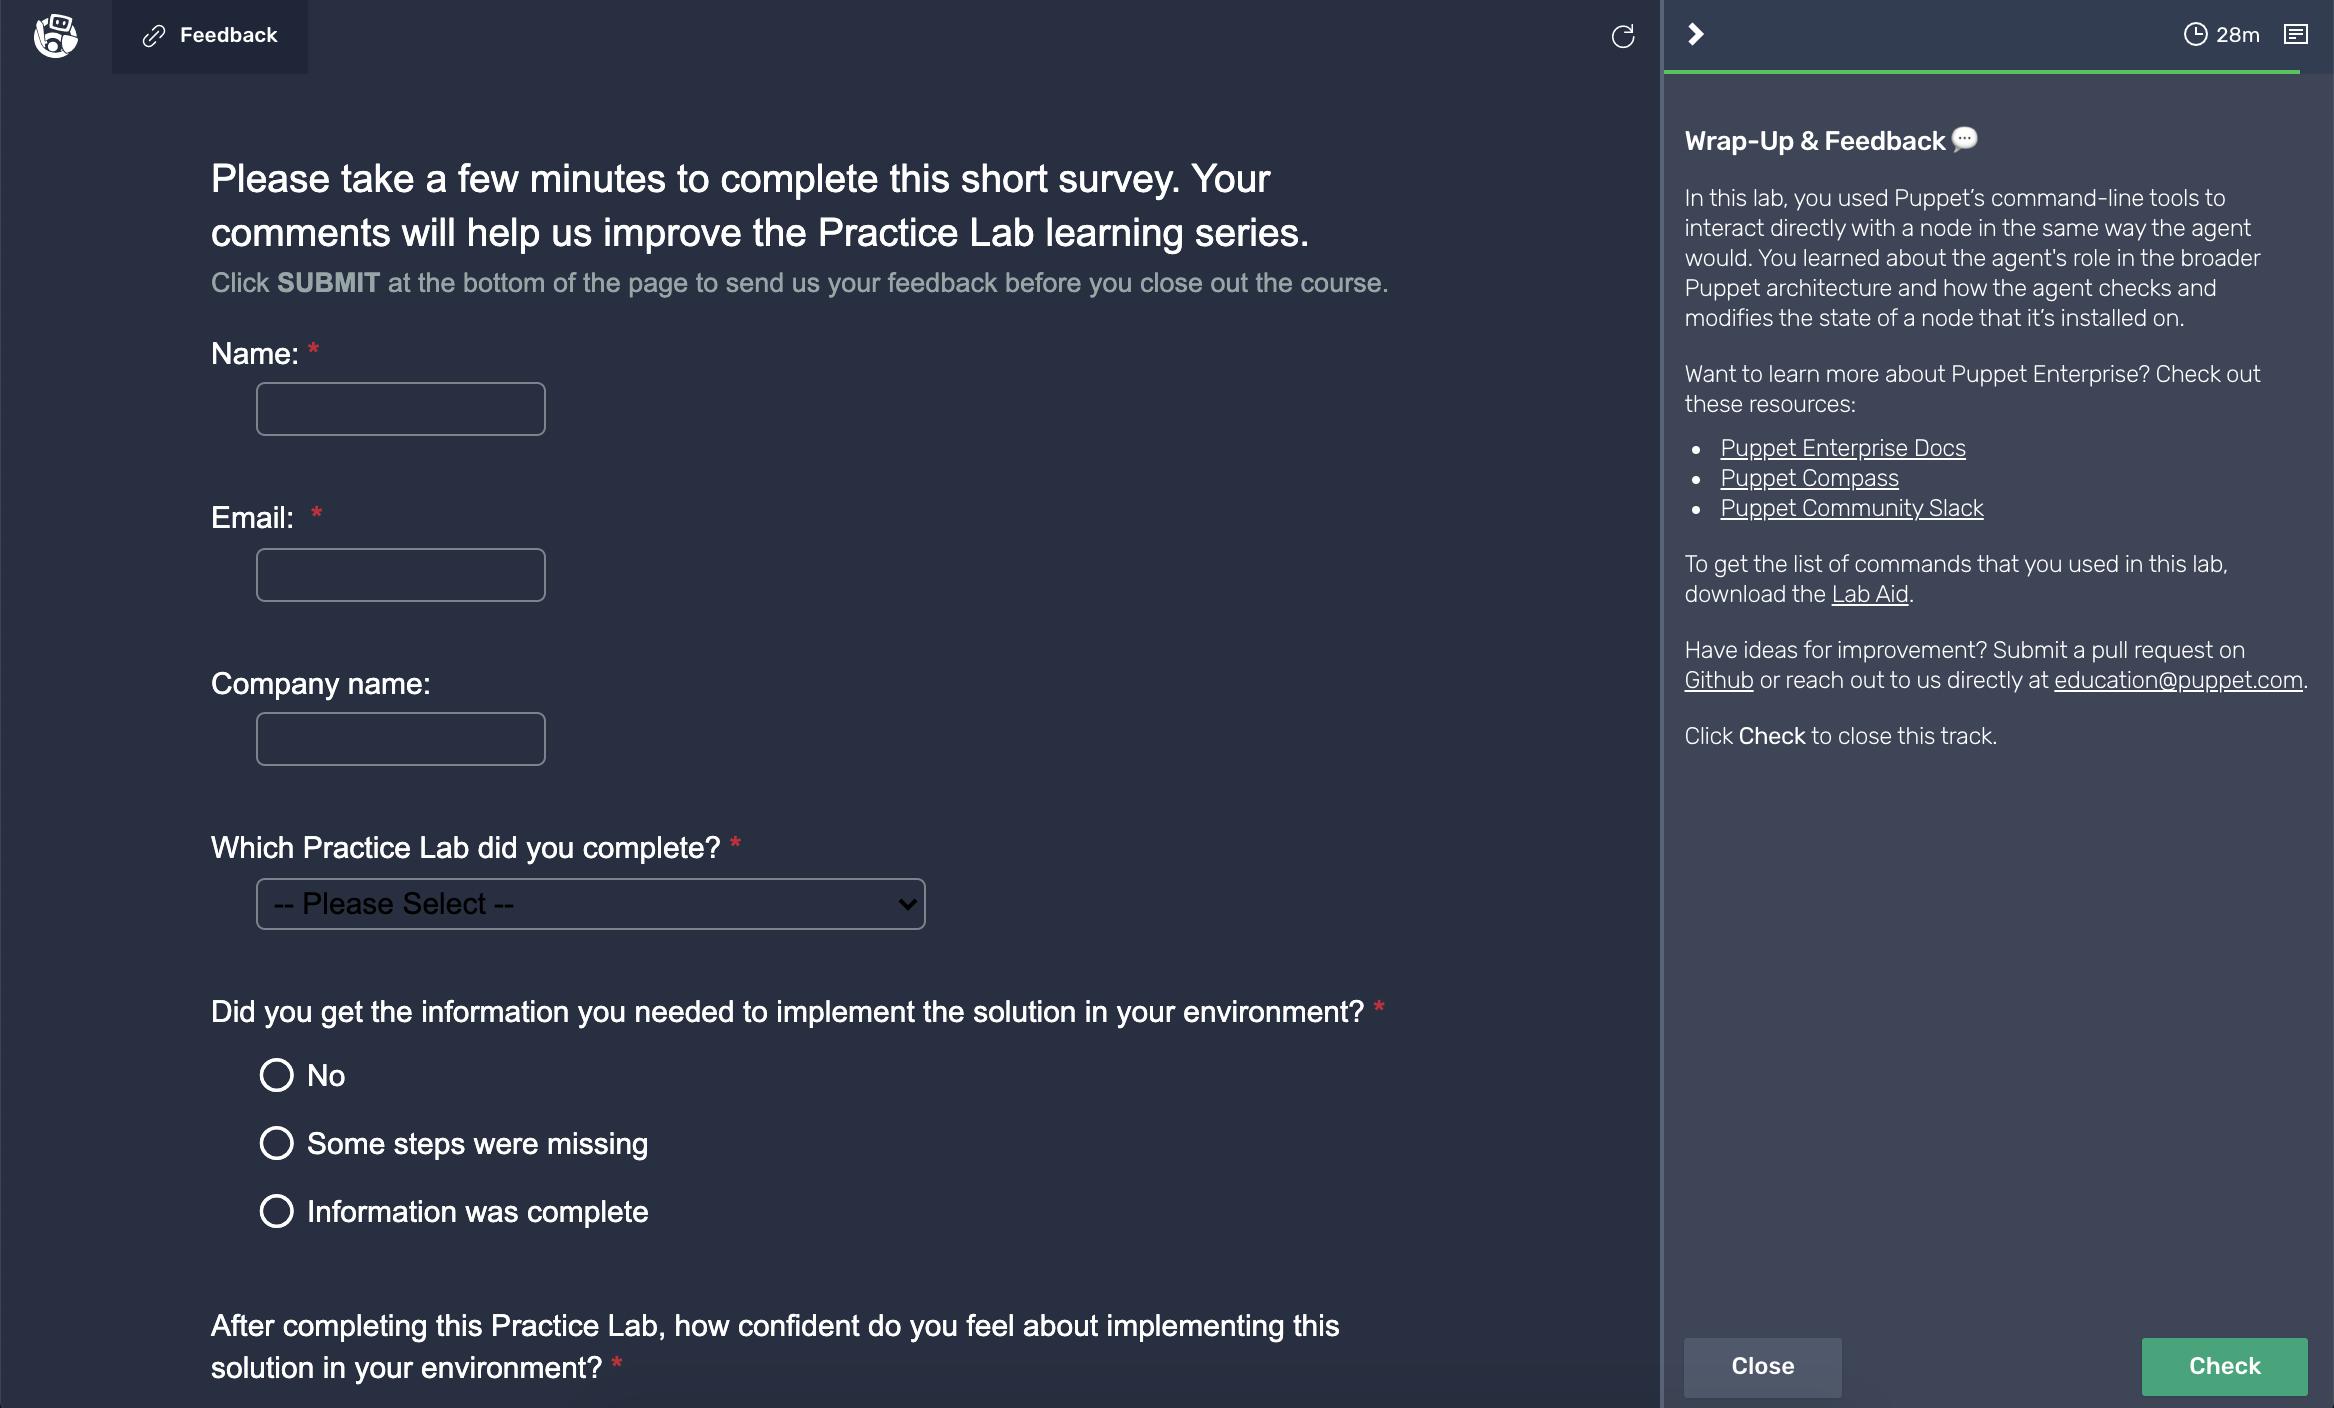 Survey Challenge Page